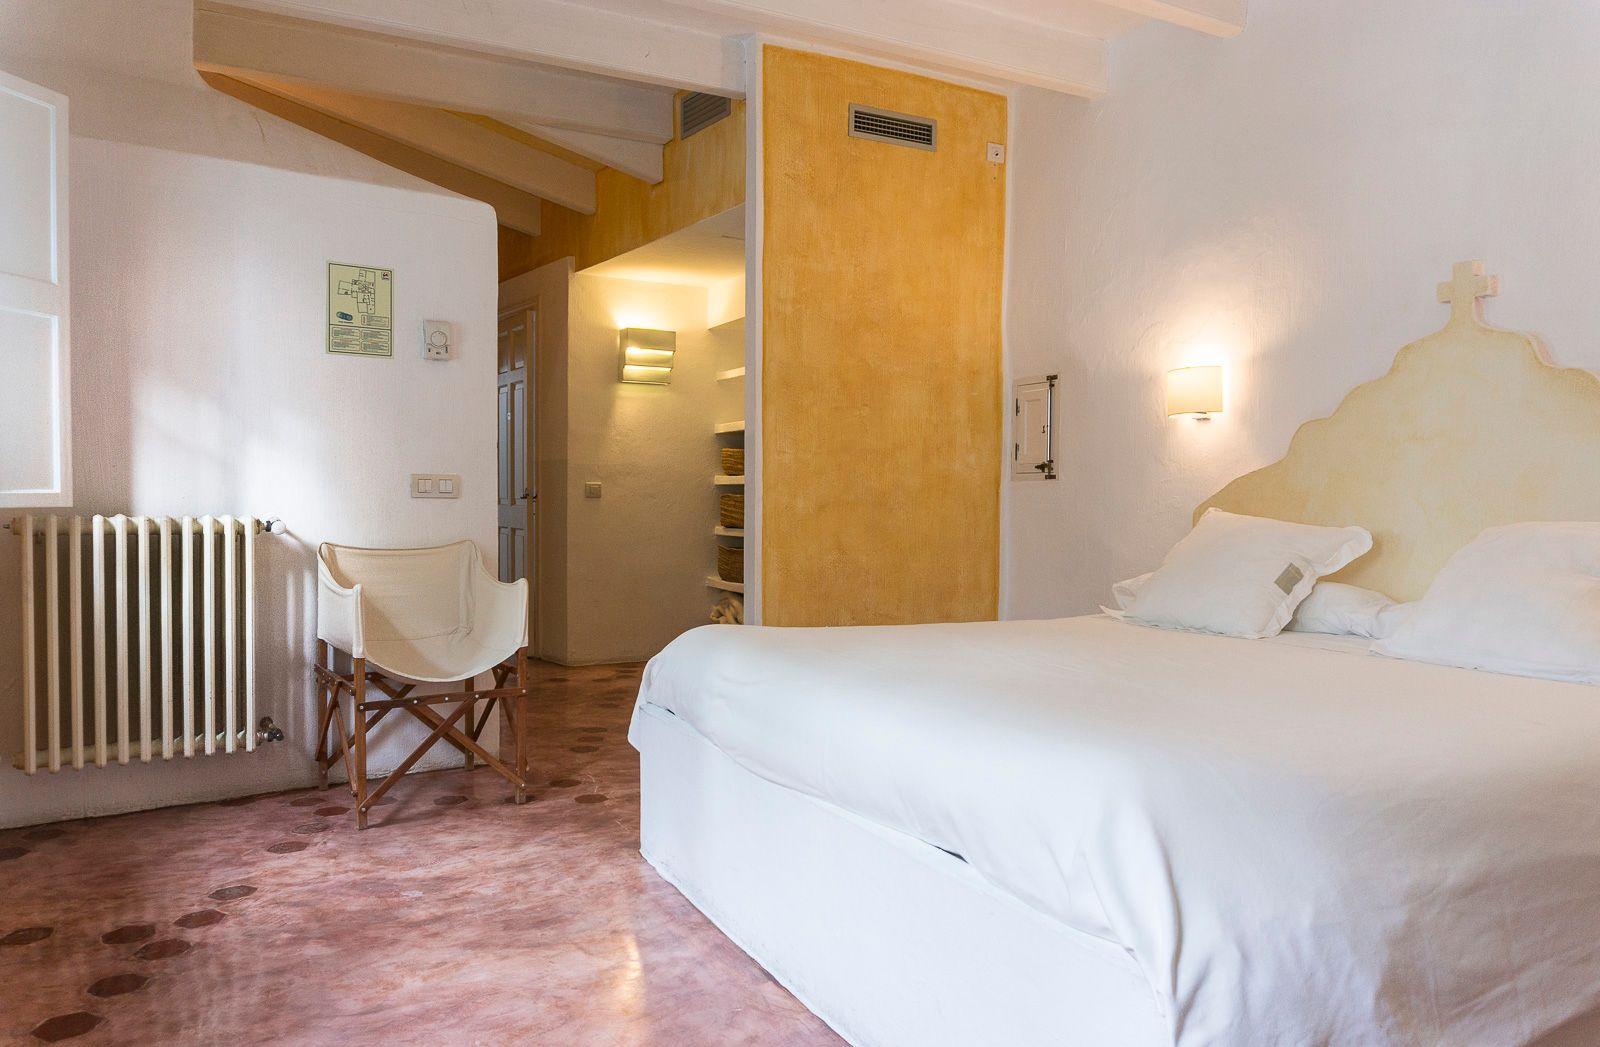 Sant Joan - Hotel Tres Sants Rooms